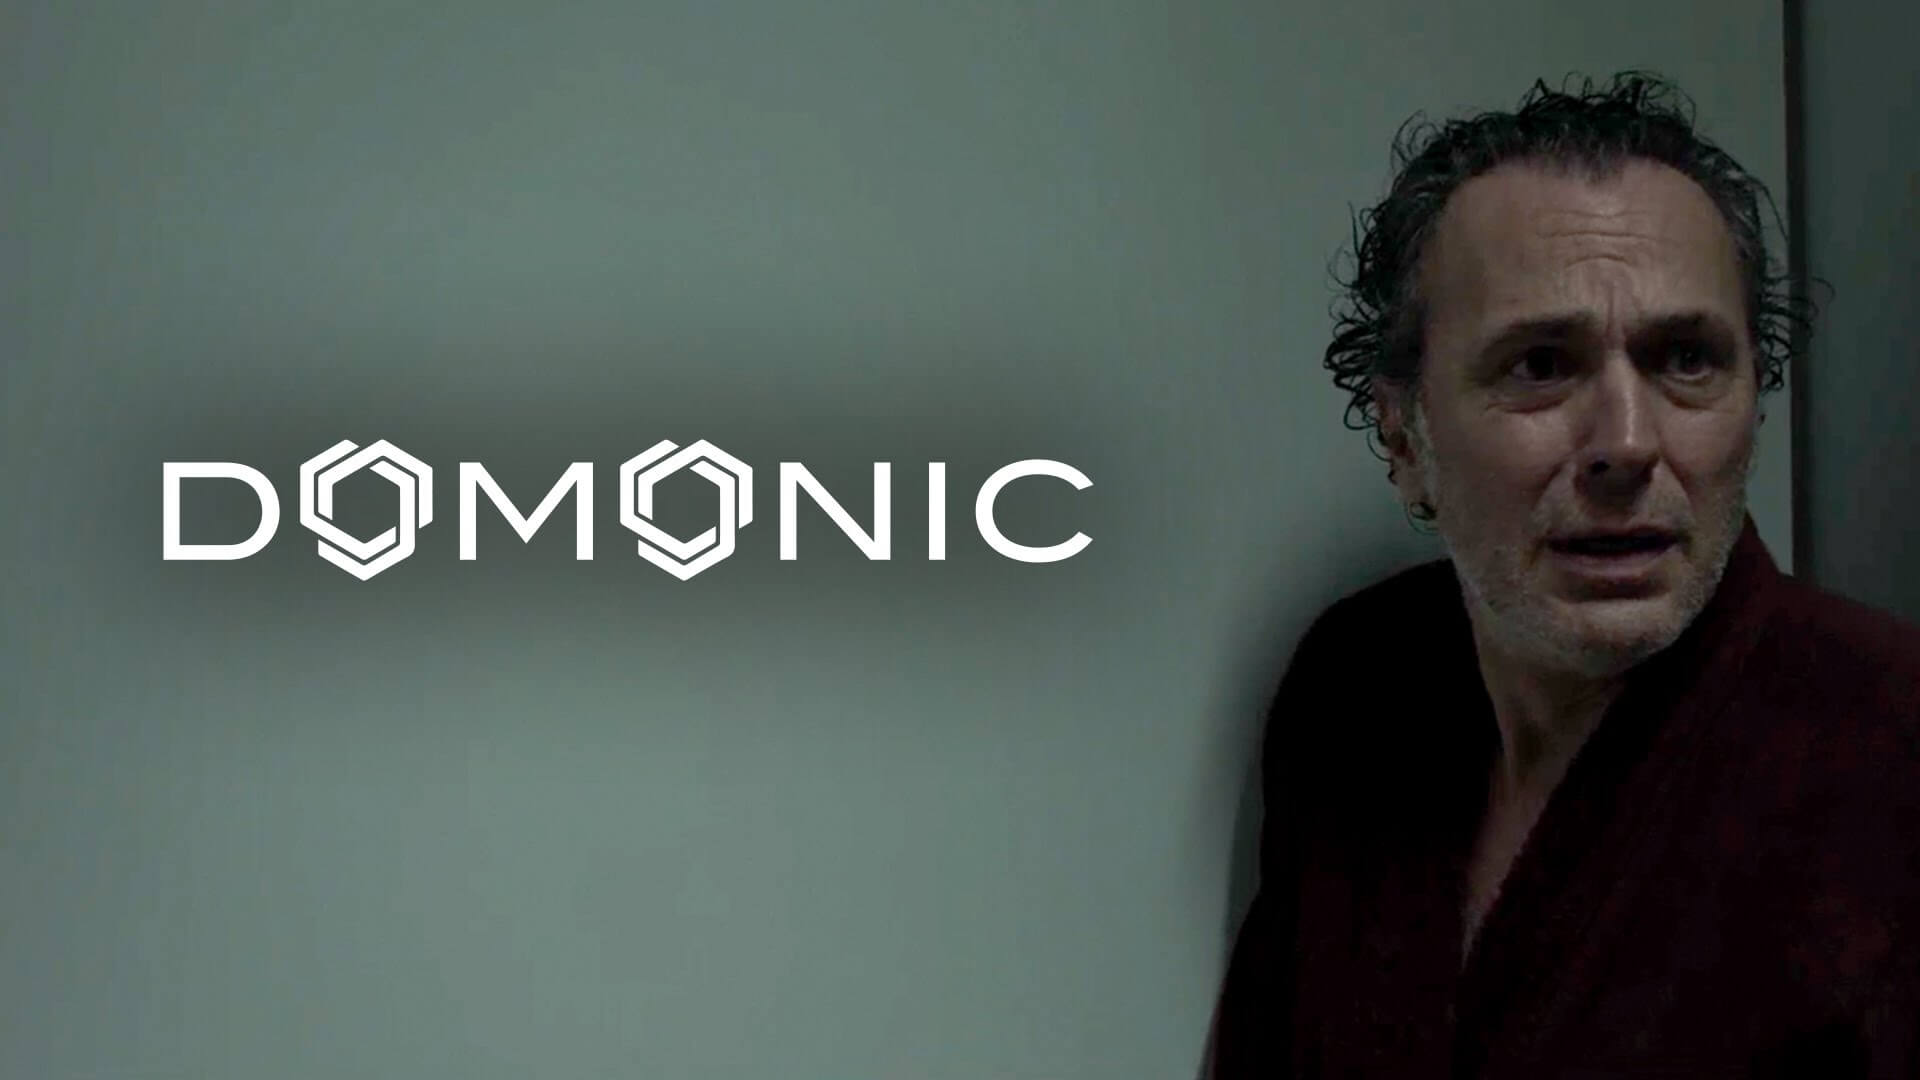 Domonic (Juan Cruz, 2015)